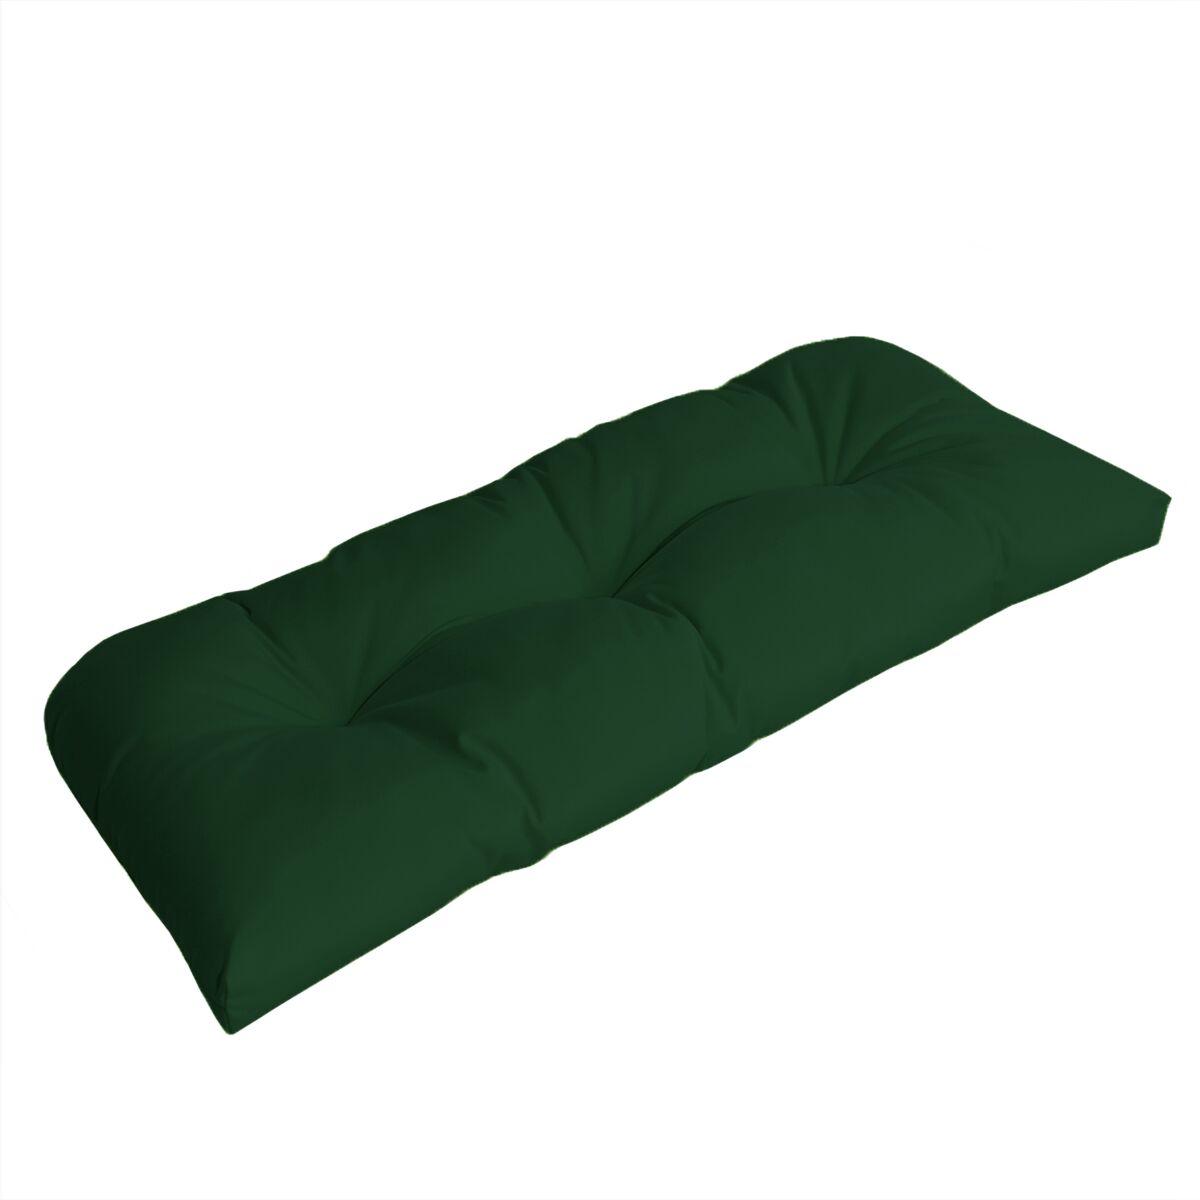 Wicker Indoor/Outdoor Sunbrella Bench Cushion Fabric: Forest Green